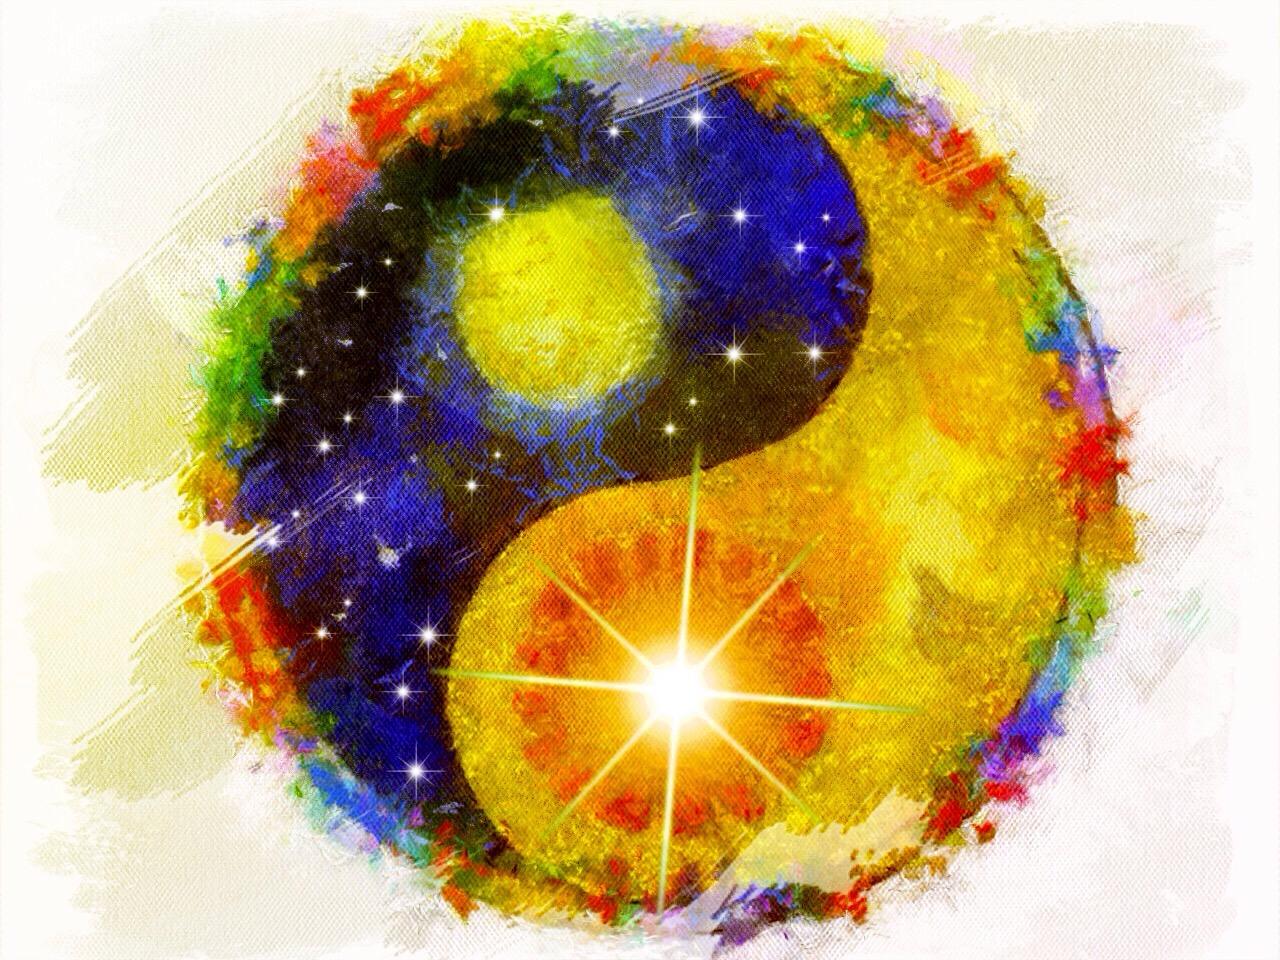 占星術的 〜潜在意識と顕在意識〜